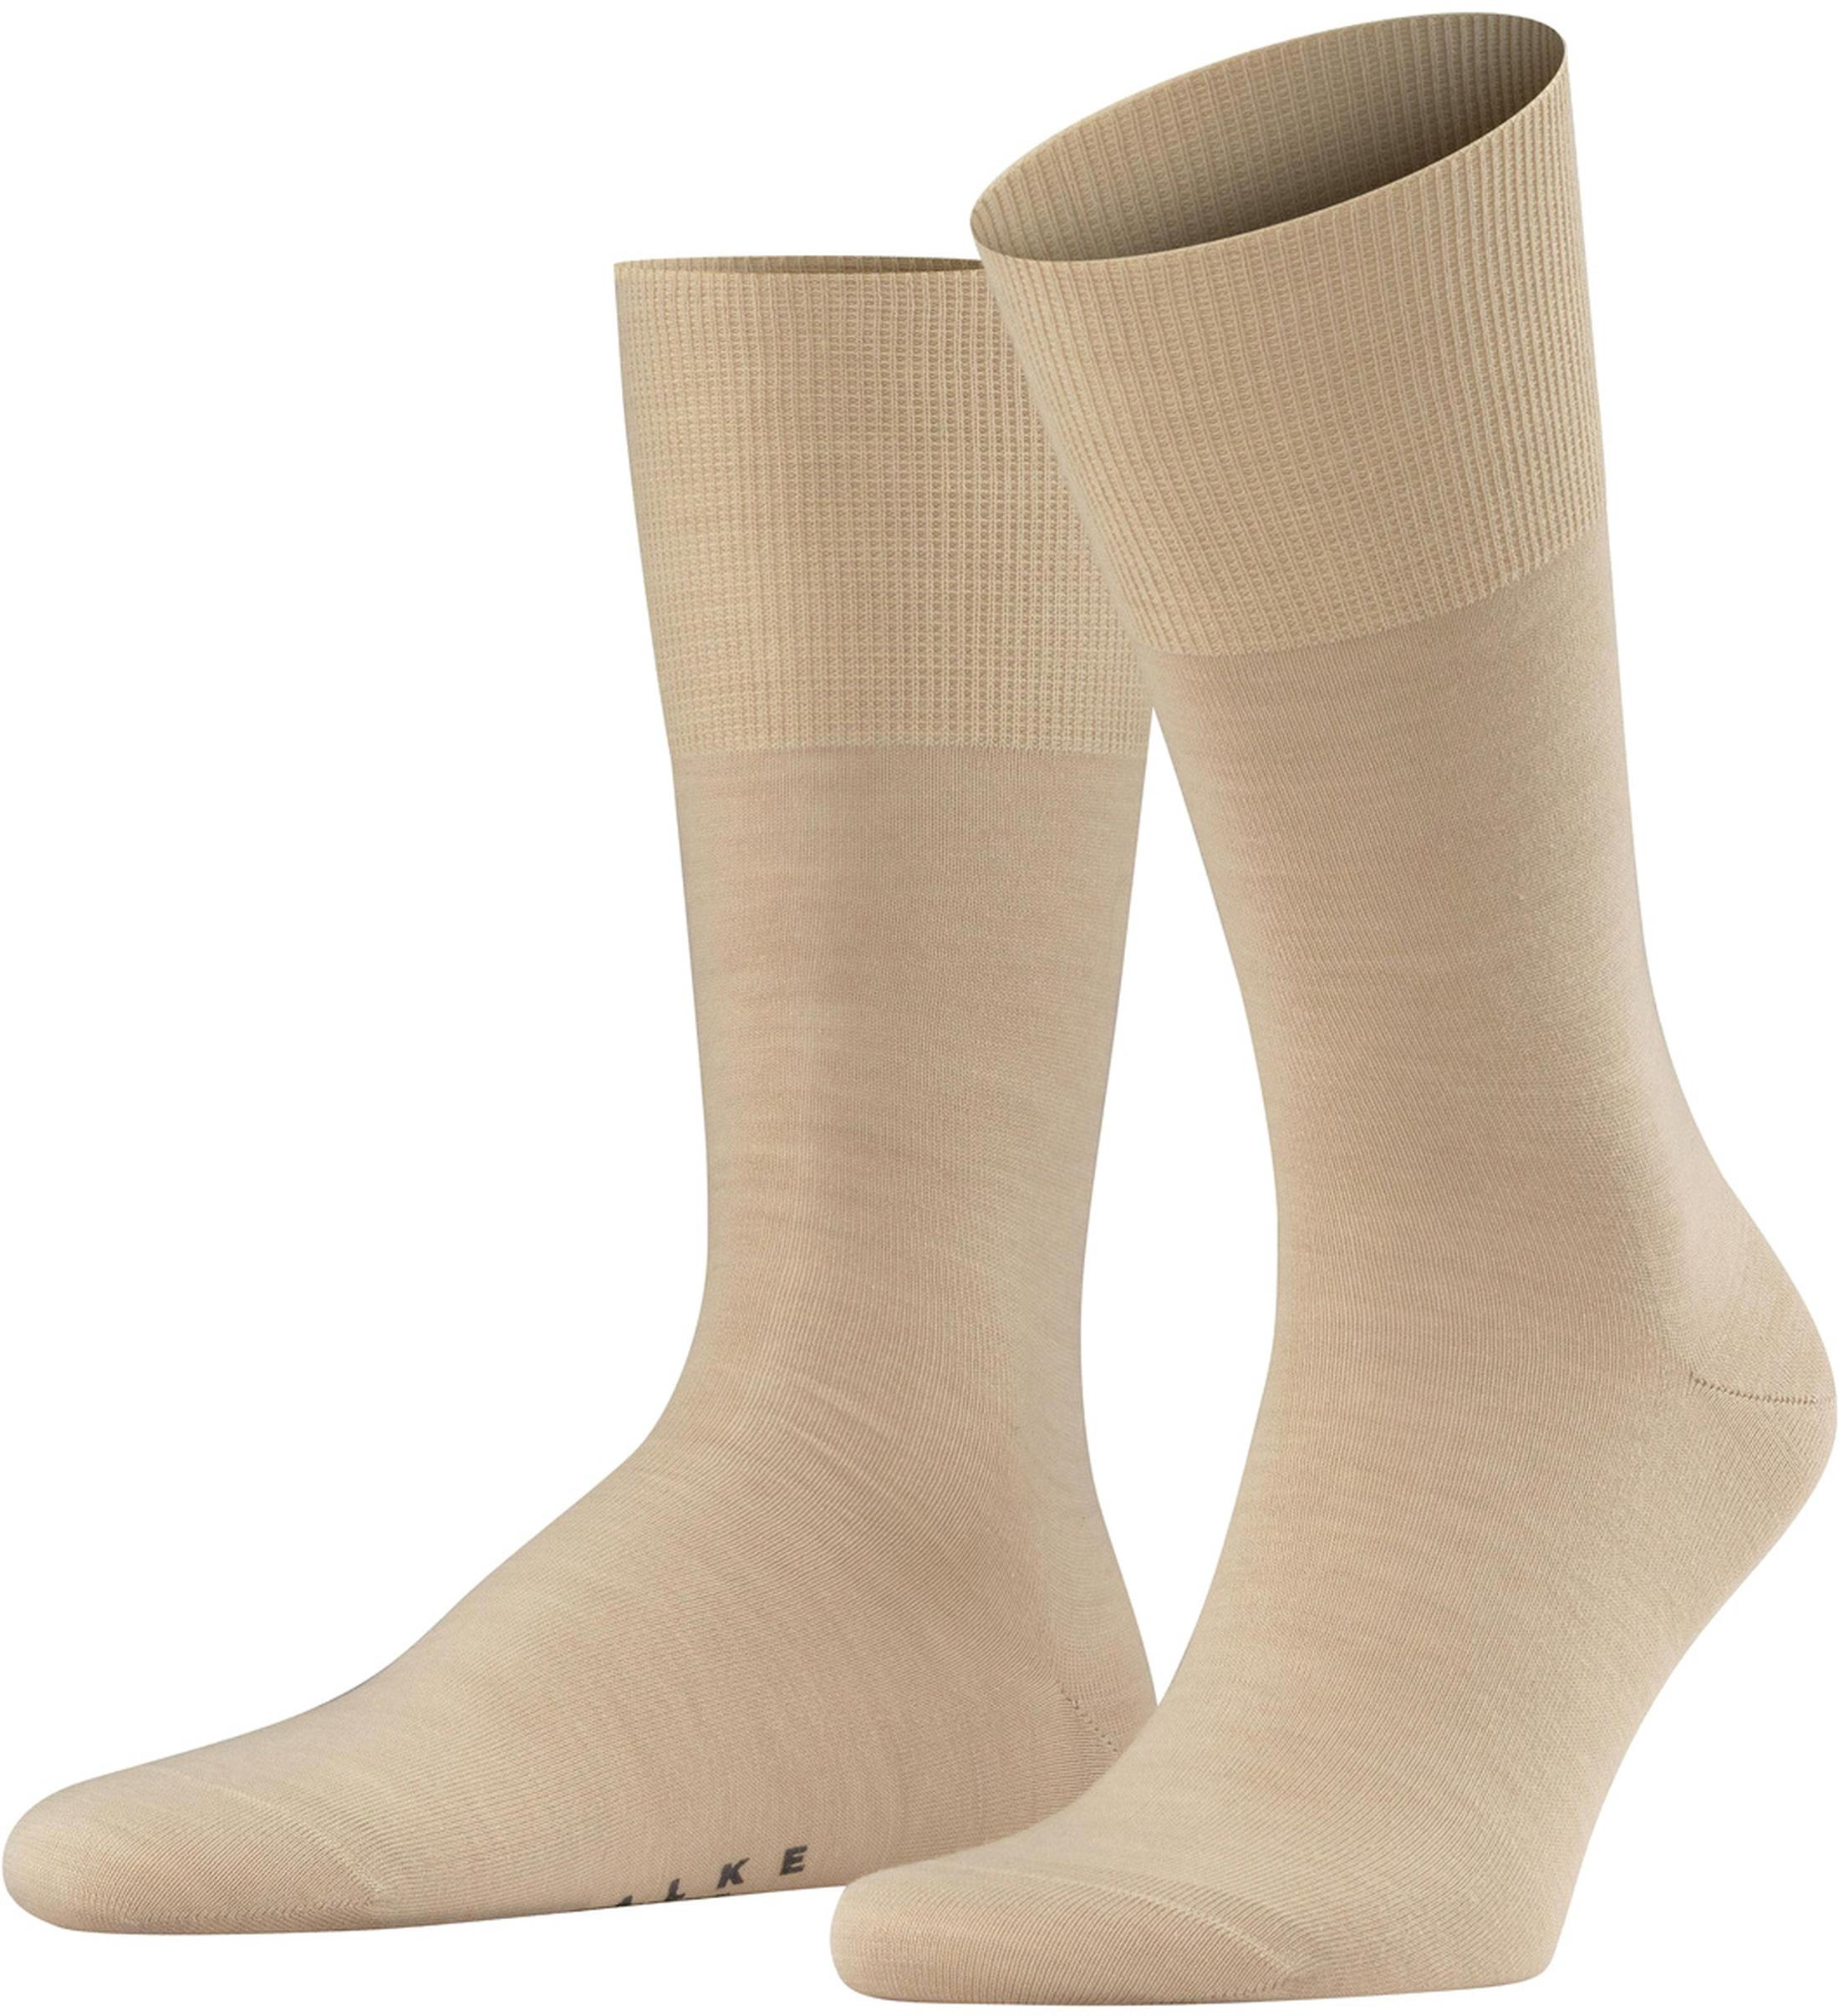 Falke Airport Socks Sand 4320